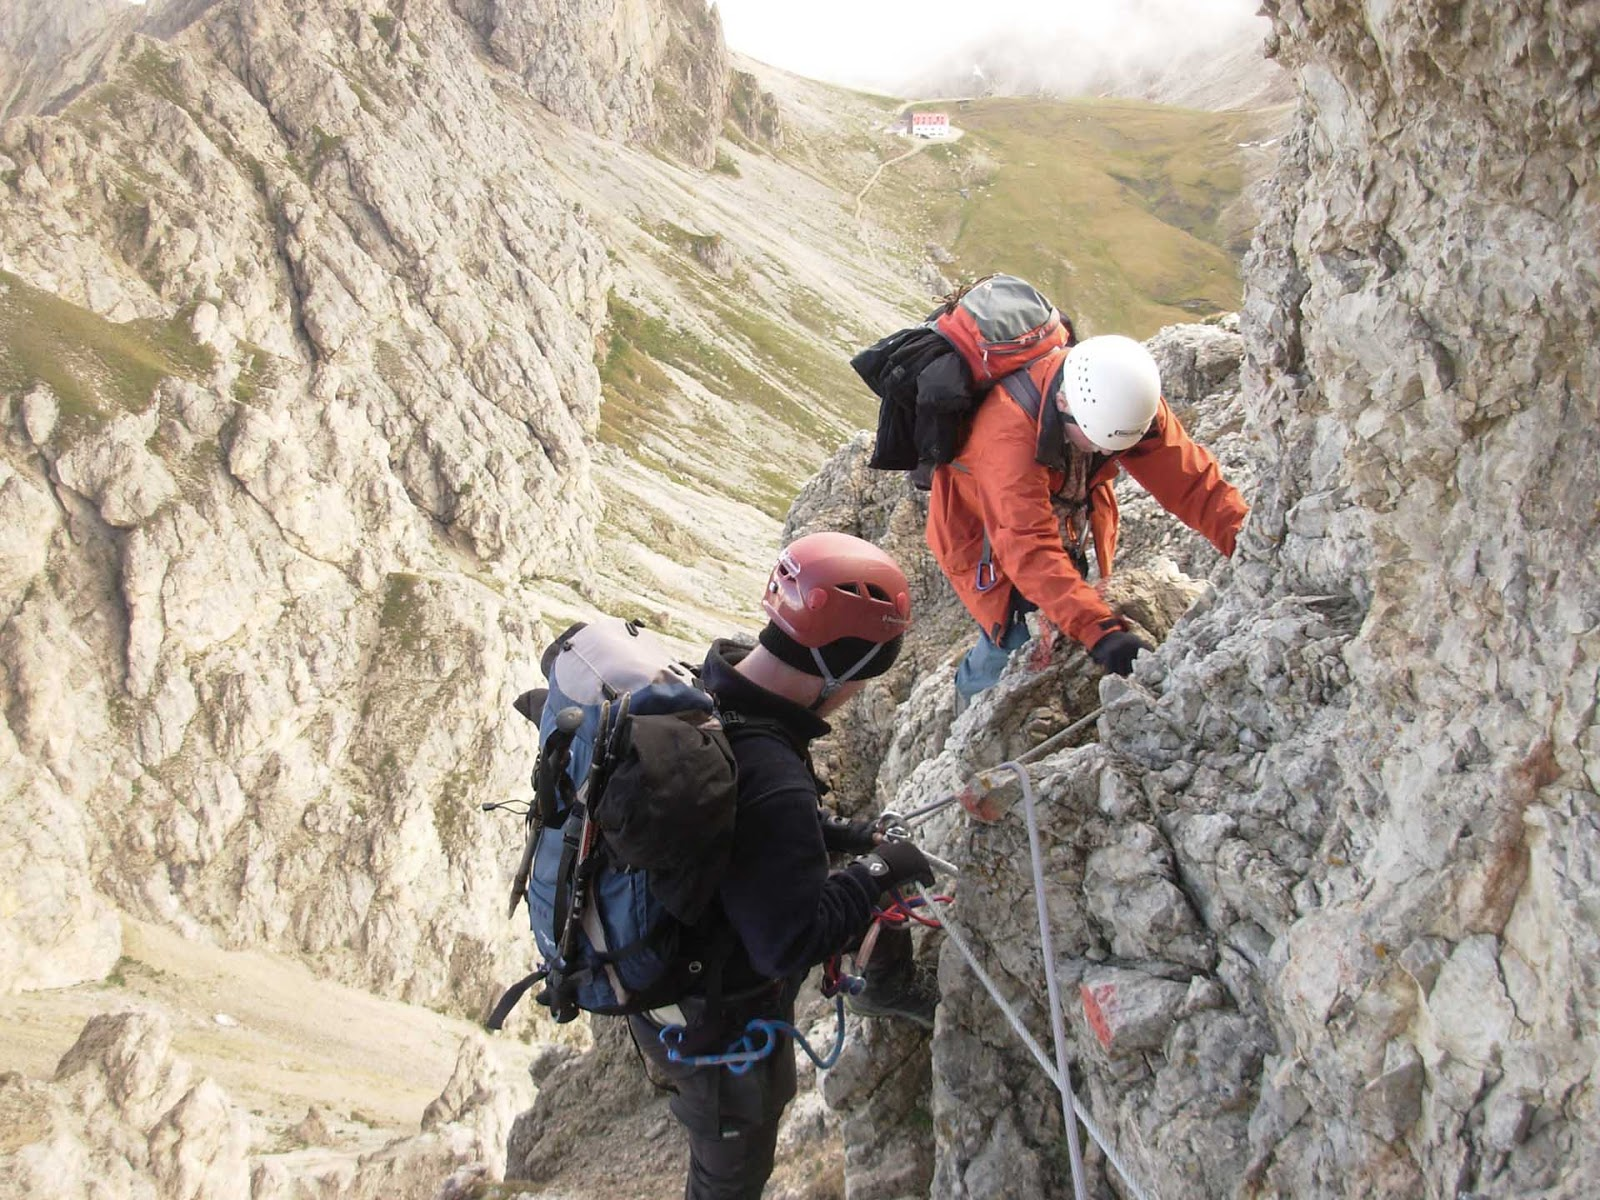 Maximilian Klettersteig : Walter obergolser klettersteig impressionen